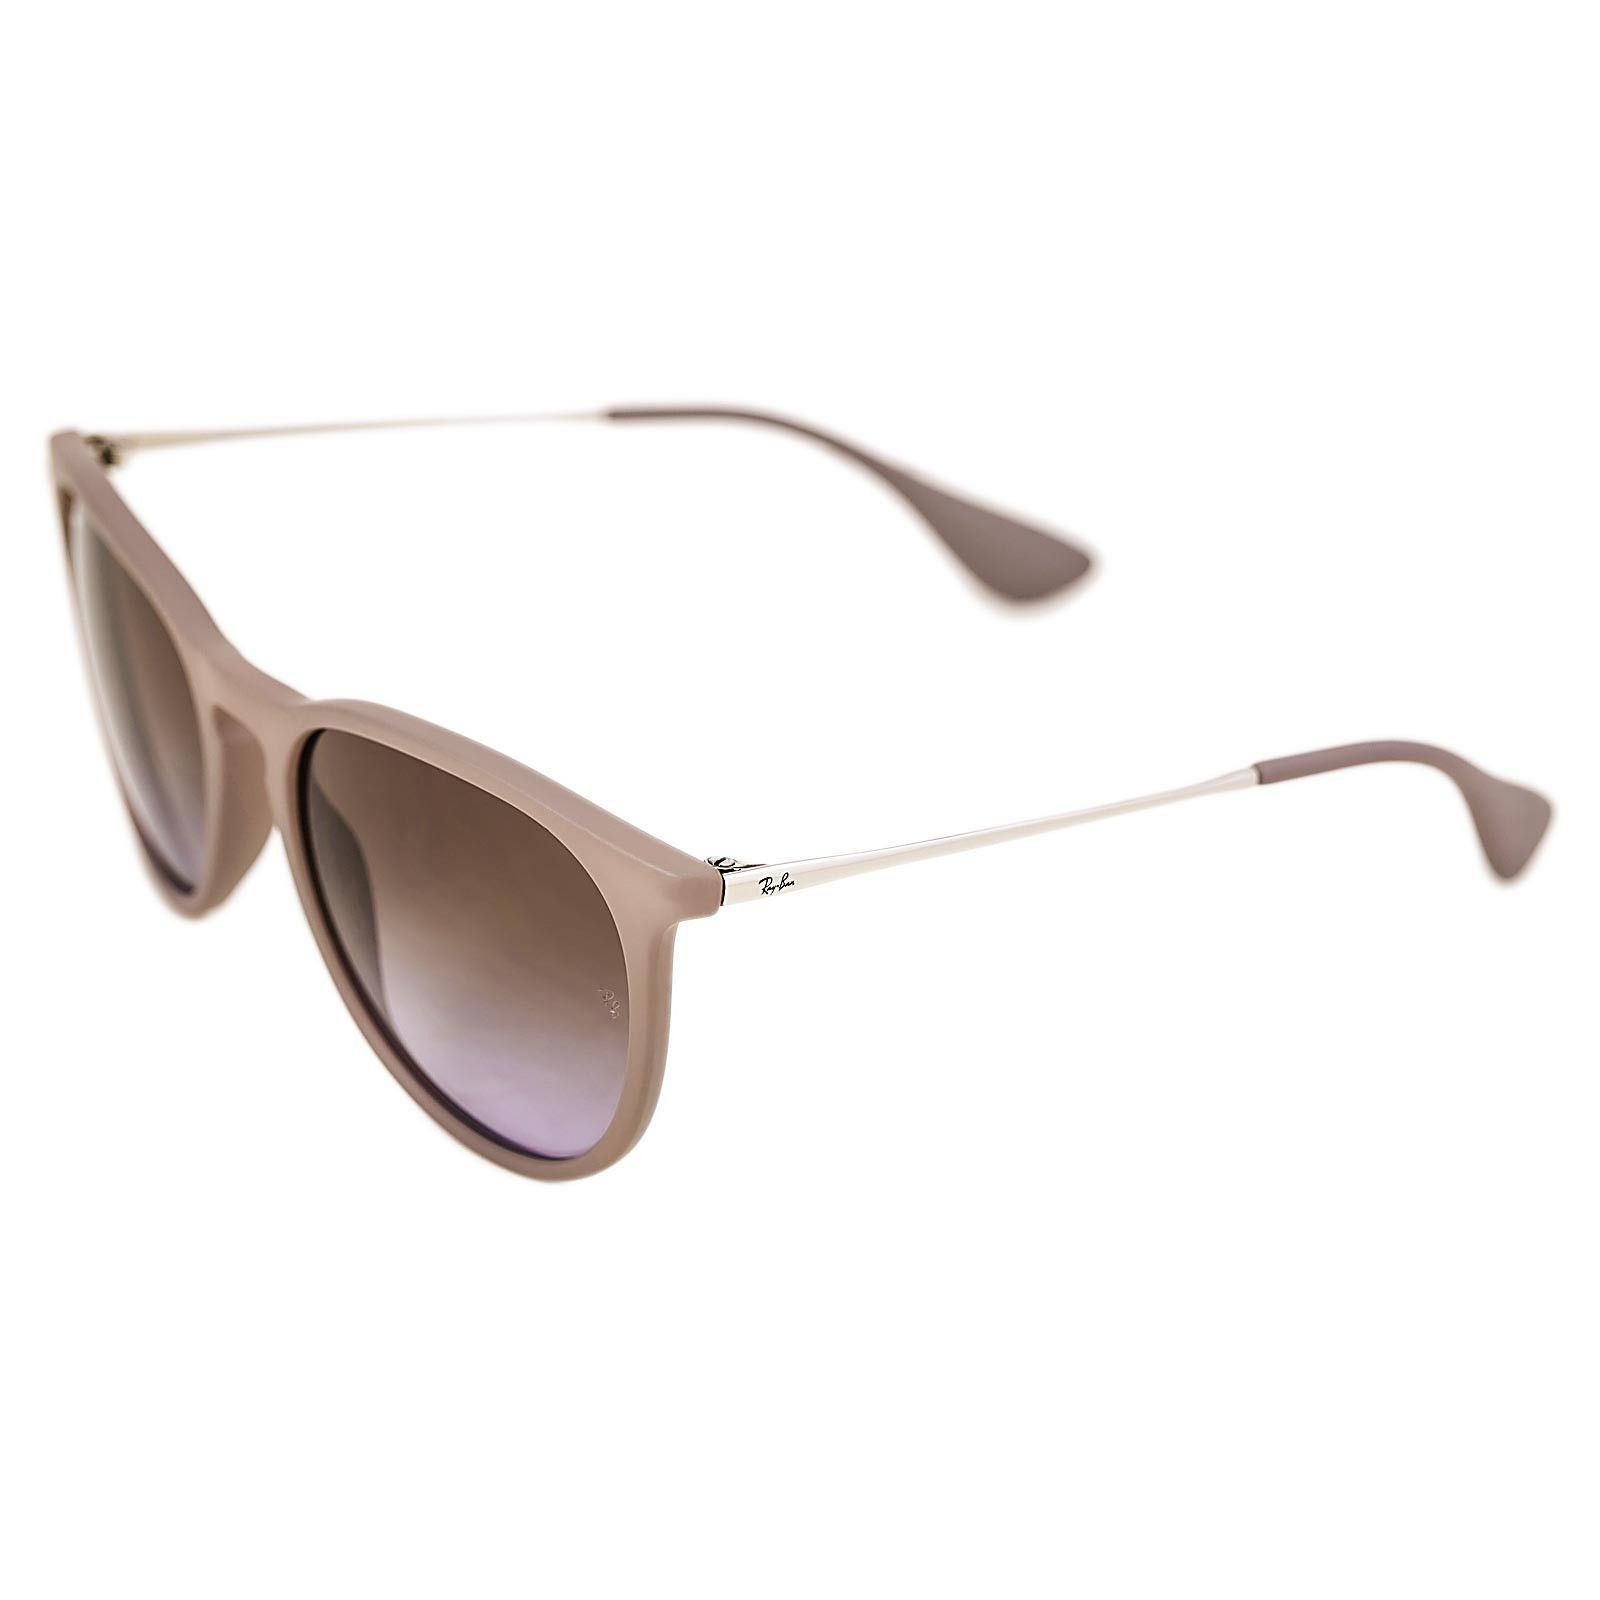 Ray-Ban RB 4171 6000-68 54 Women s Erika Classic Brown   Violet Gradient  Lenses Brown Nylon Frame Sunglasses 2db2388aff4